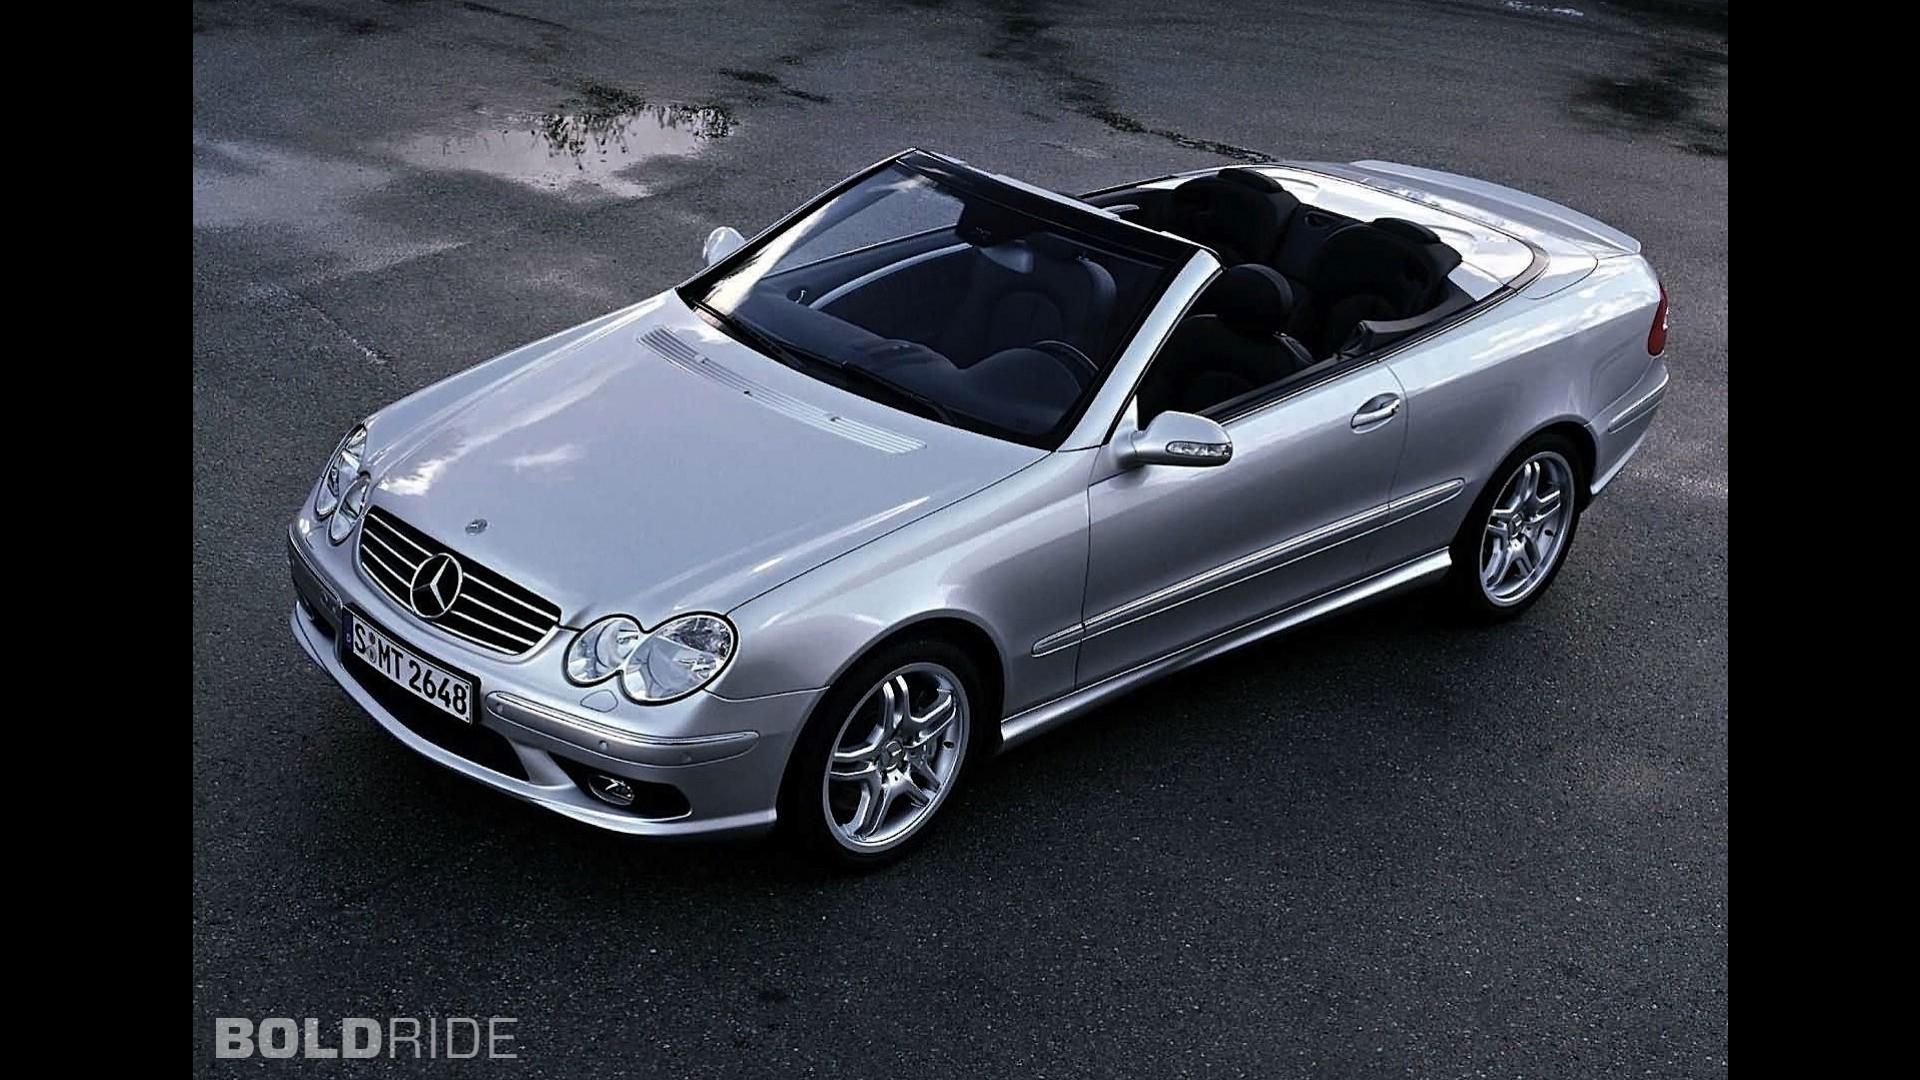 Mercedes benz clk55 amg cabriolet for Mercedes benz clk55 amg